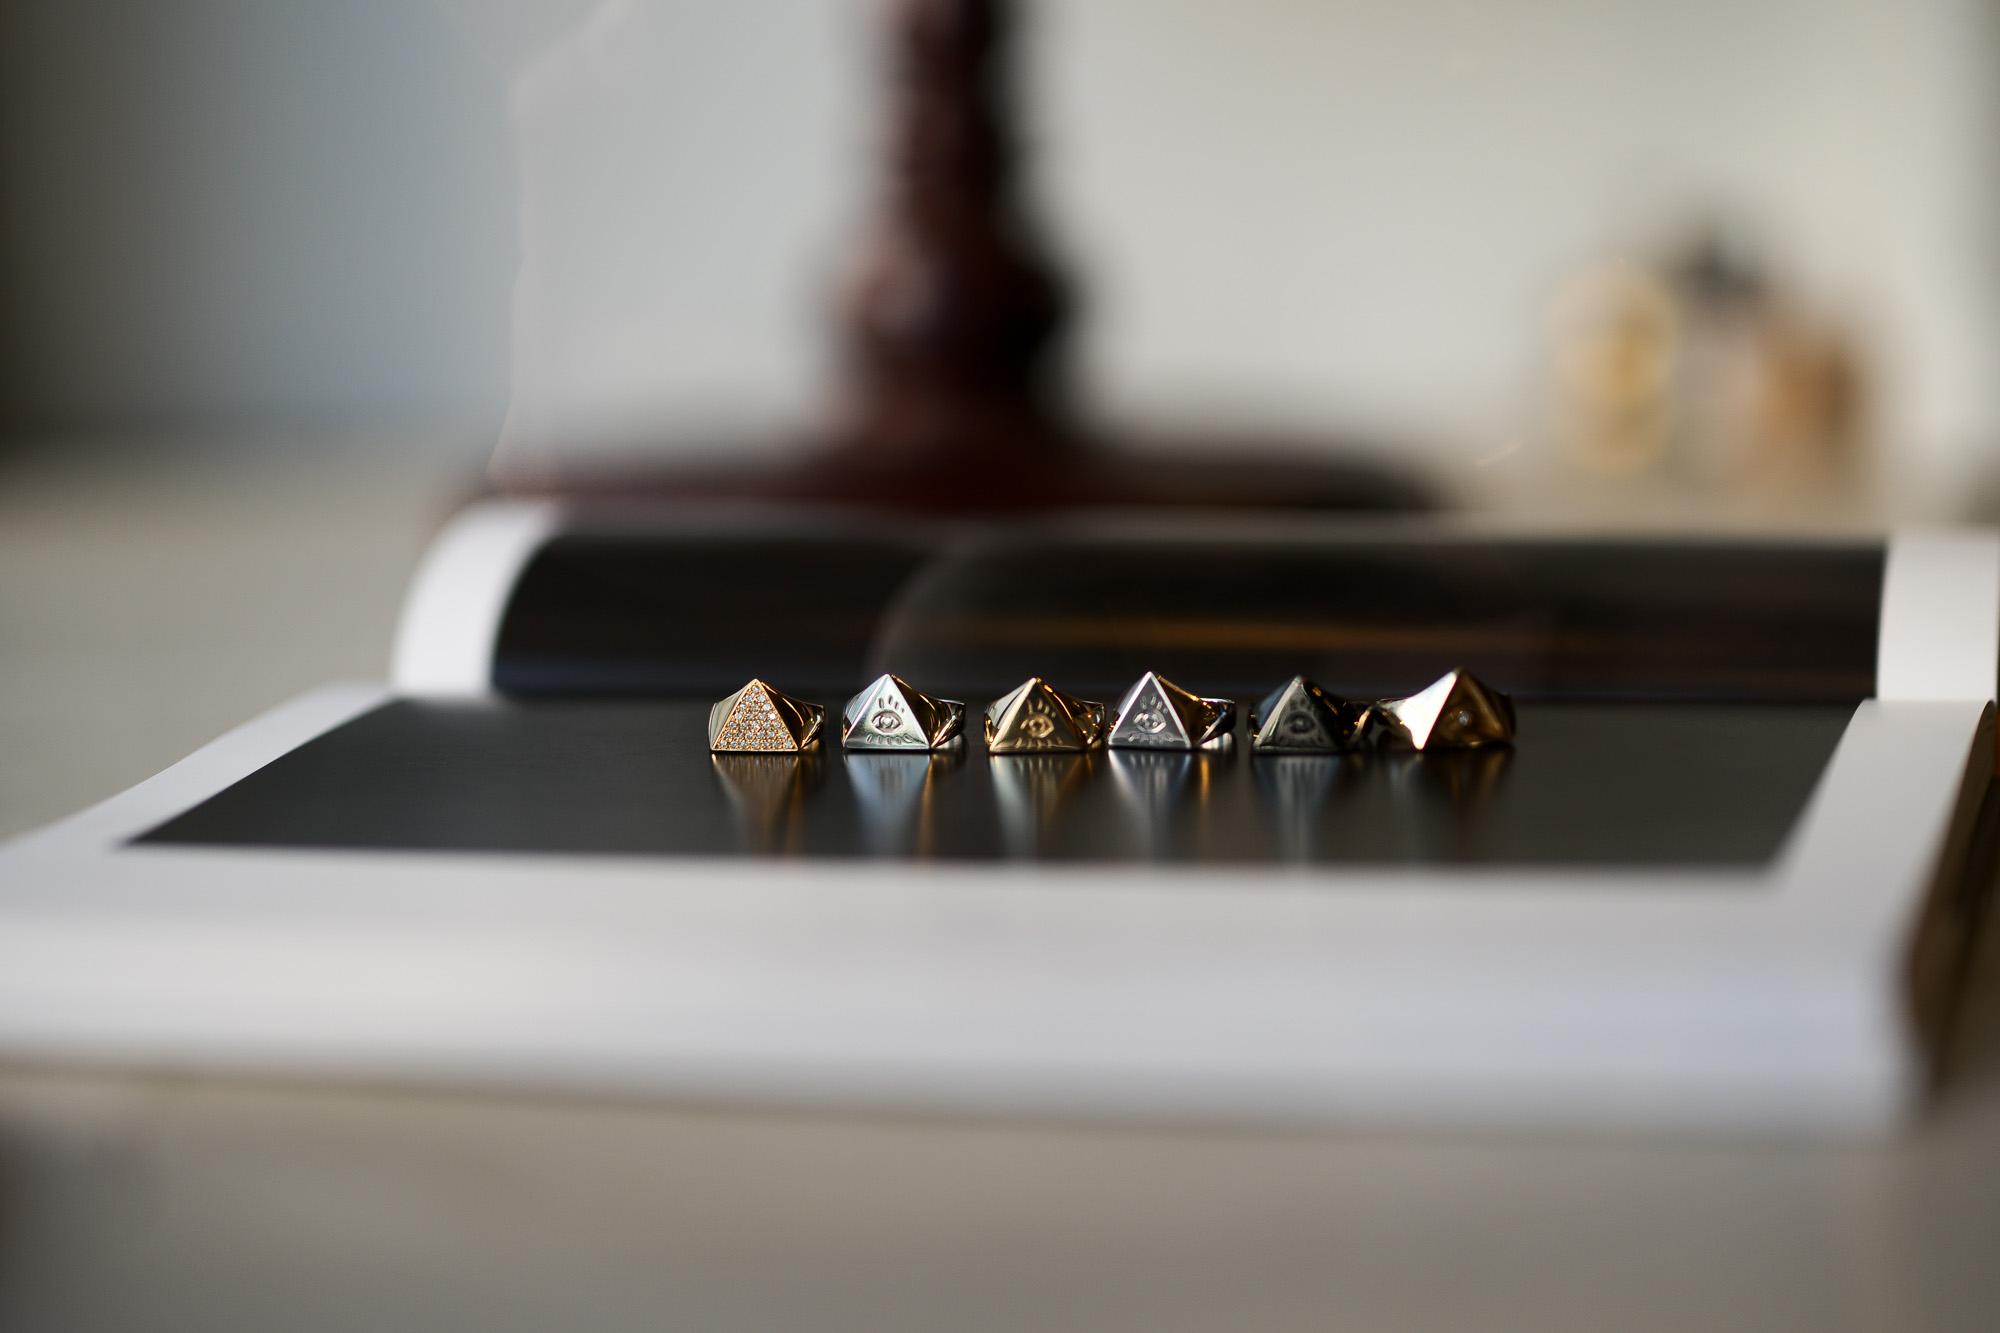 "FIXER ""ILLUMINATI EYES RING FULL PAVE WHITE DIAMOND 22K GOLD"" × FIXER ""ILLUMINATI EYES RING 18K WHITE GOLD"" × FIXER ""ILLUMINATI EYES RING 18K GOLD"" × FIXER ""ILLUMINATI EYES RING 925 STERLING SILVER"" × FIXER ""ILLUMINATI EYES RING BLACK RHODIUM"" × FIXER ""ILLUMINATI EYES RING 18K GOLD SP"" フィクサー イルミナティ アイズリング 18Kゴールド 18Kホワイトゴールド 925スターリングシルバー ブラックロジウム 22Kゴールド スペシャルリング イルミナティリング 愛知 名古屋 altoediritto アルトエデリット"